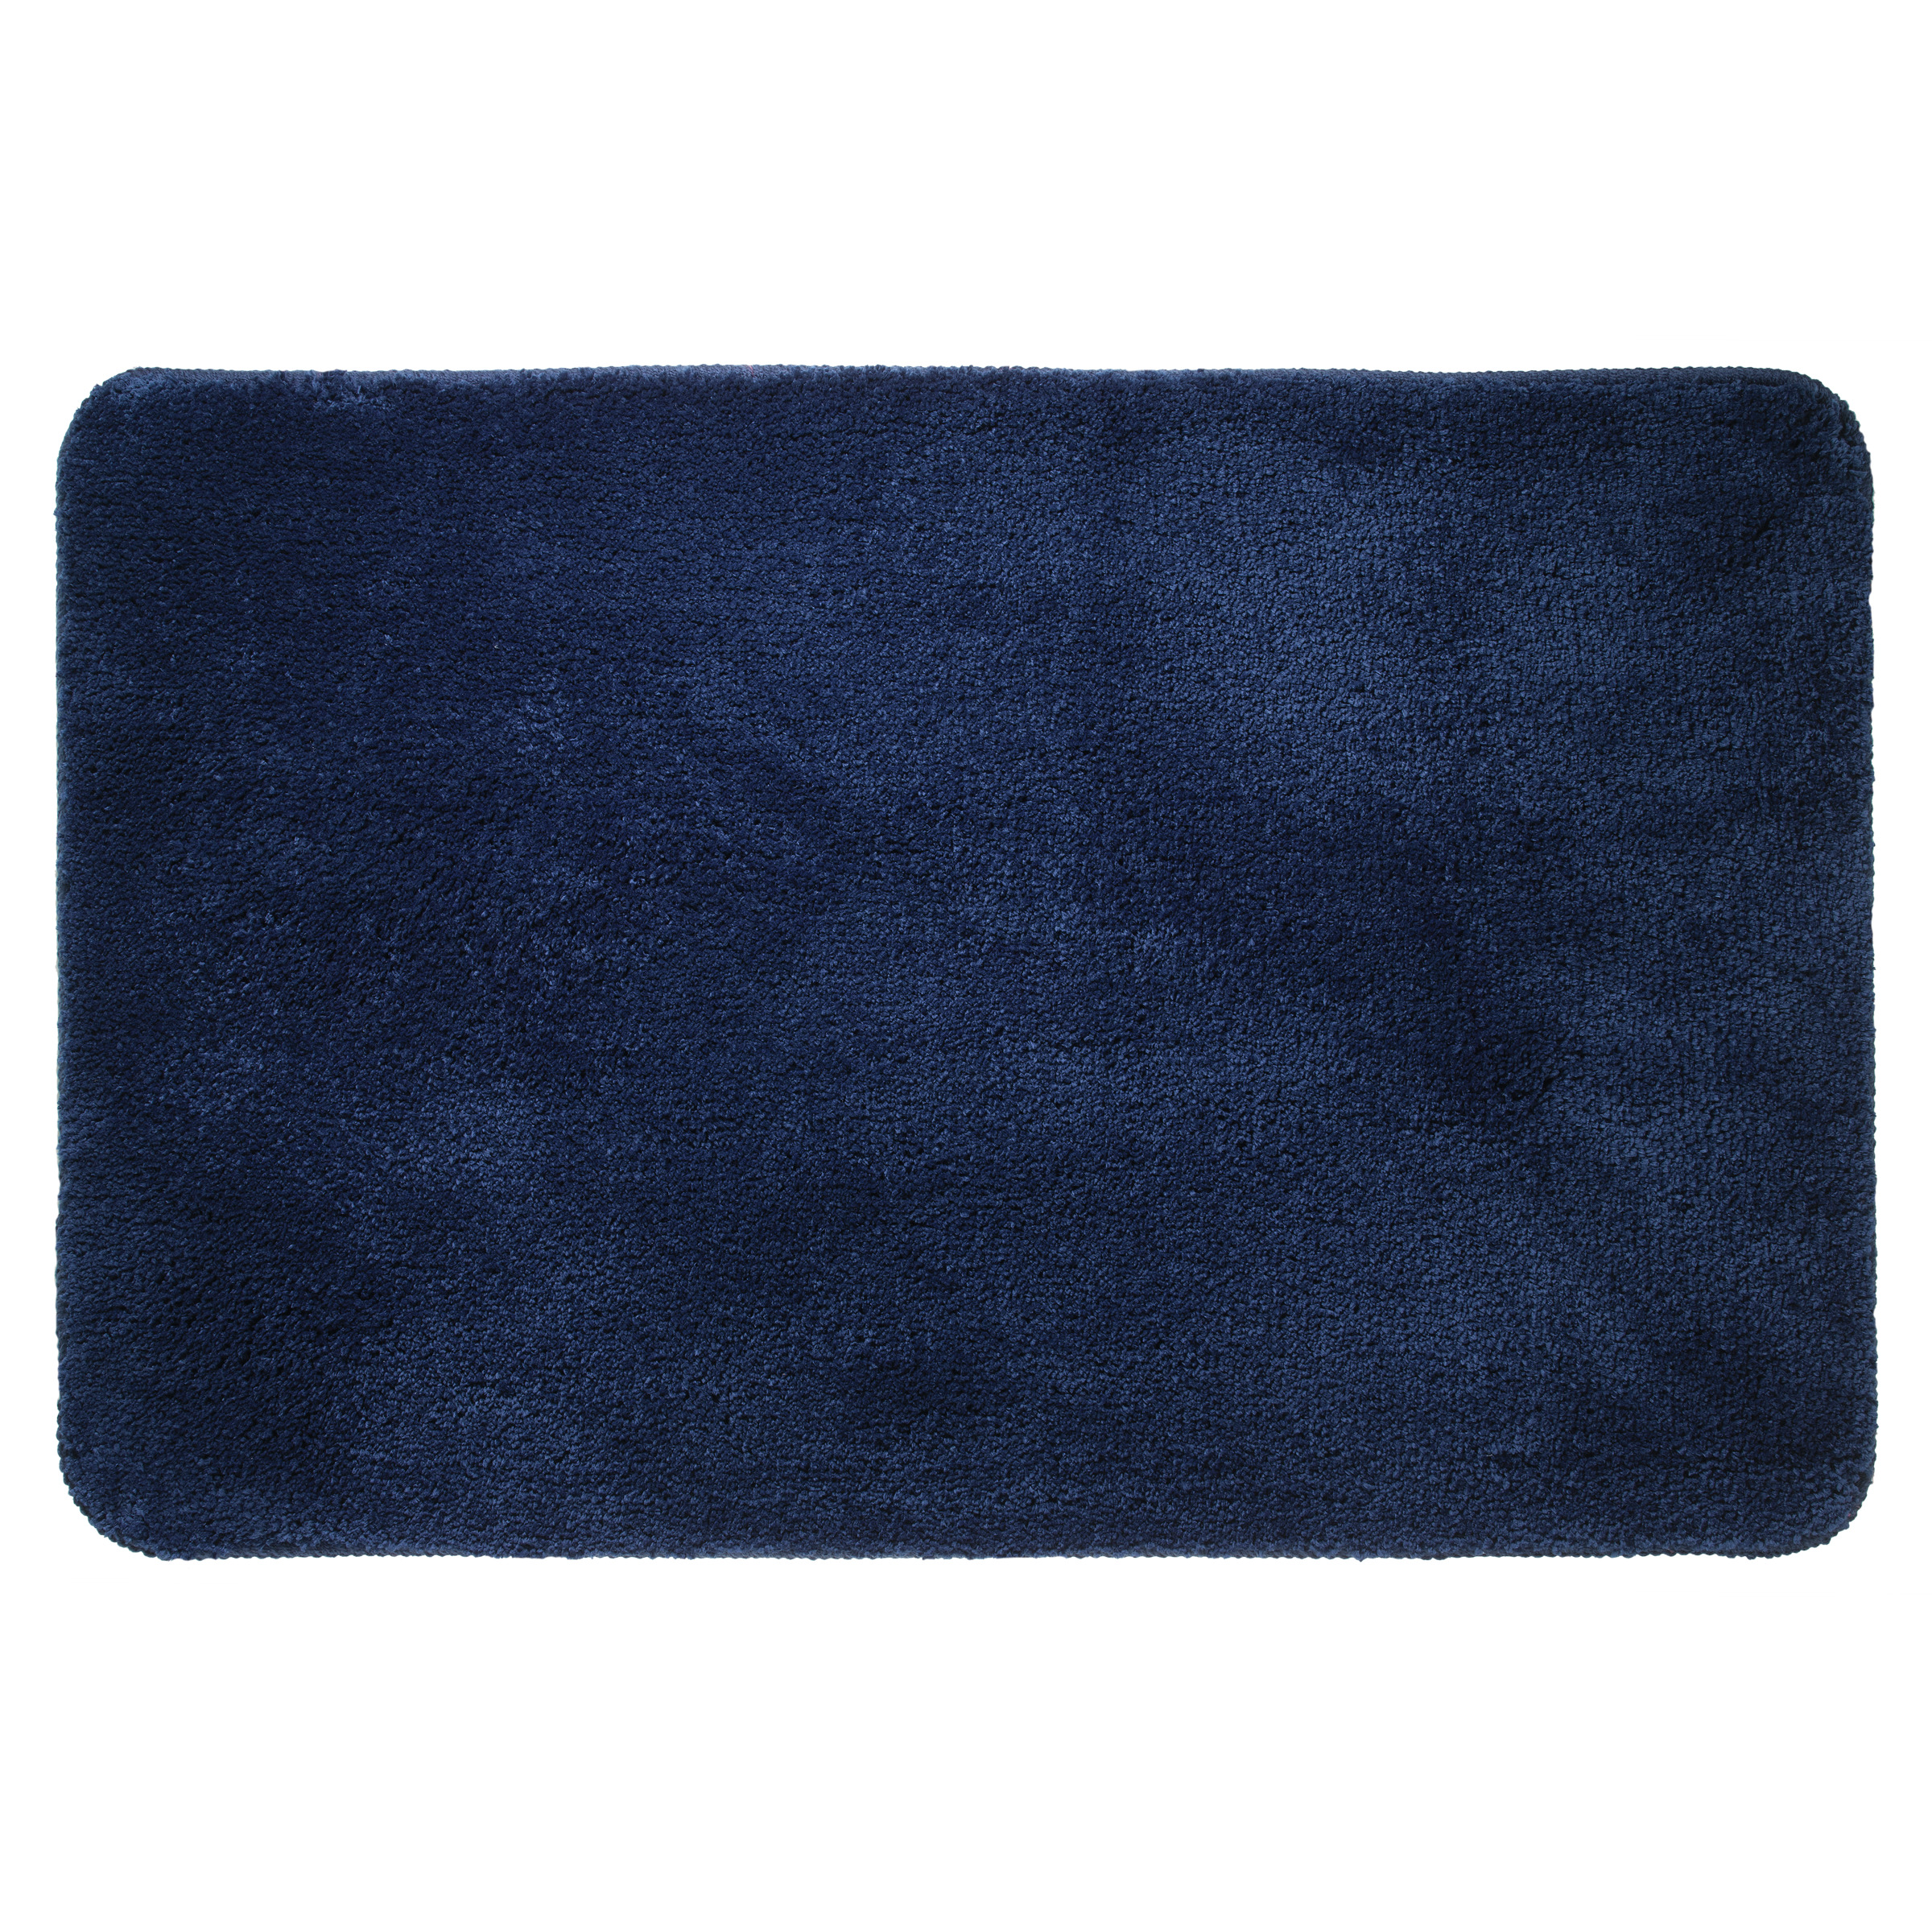 Sealskin Angora badmat 90x60cm polyester Blauw